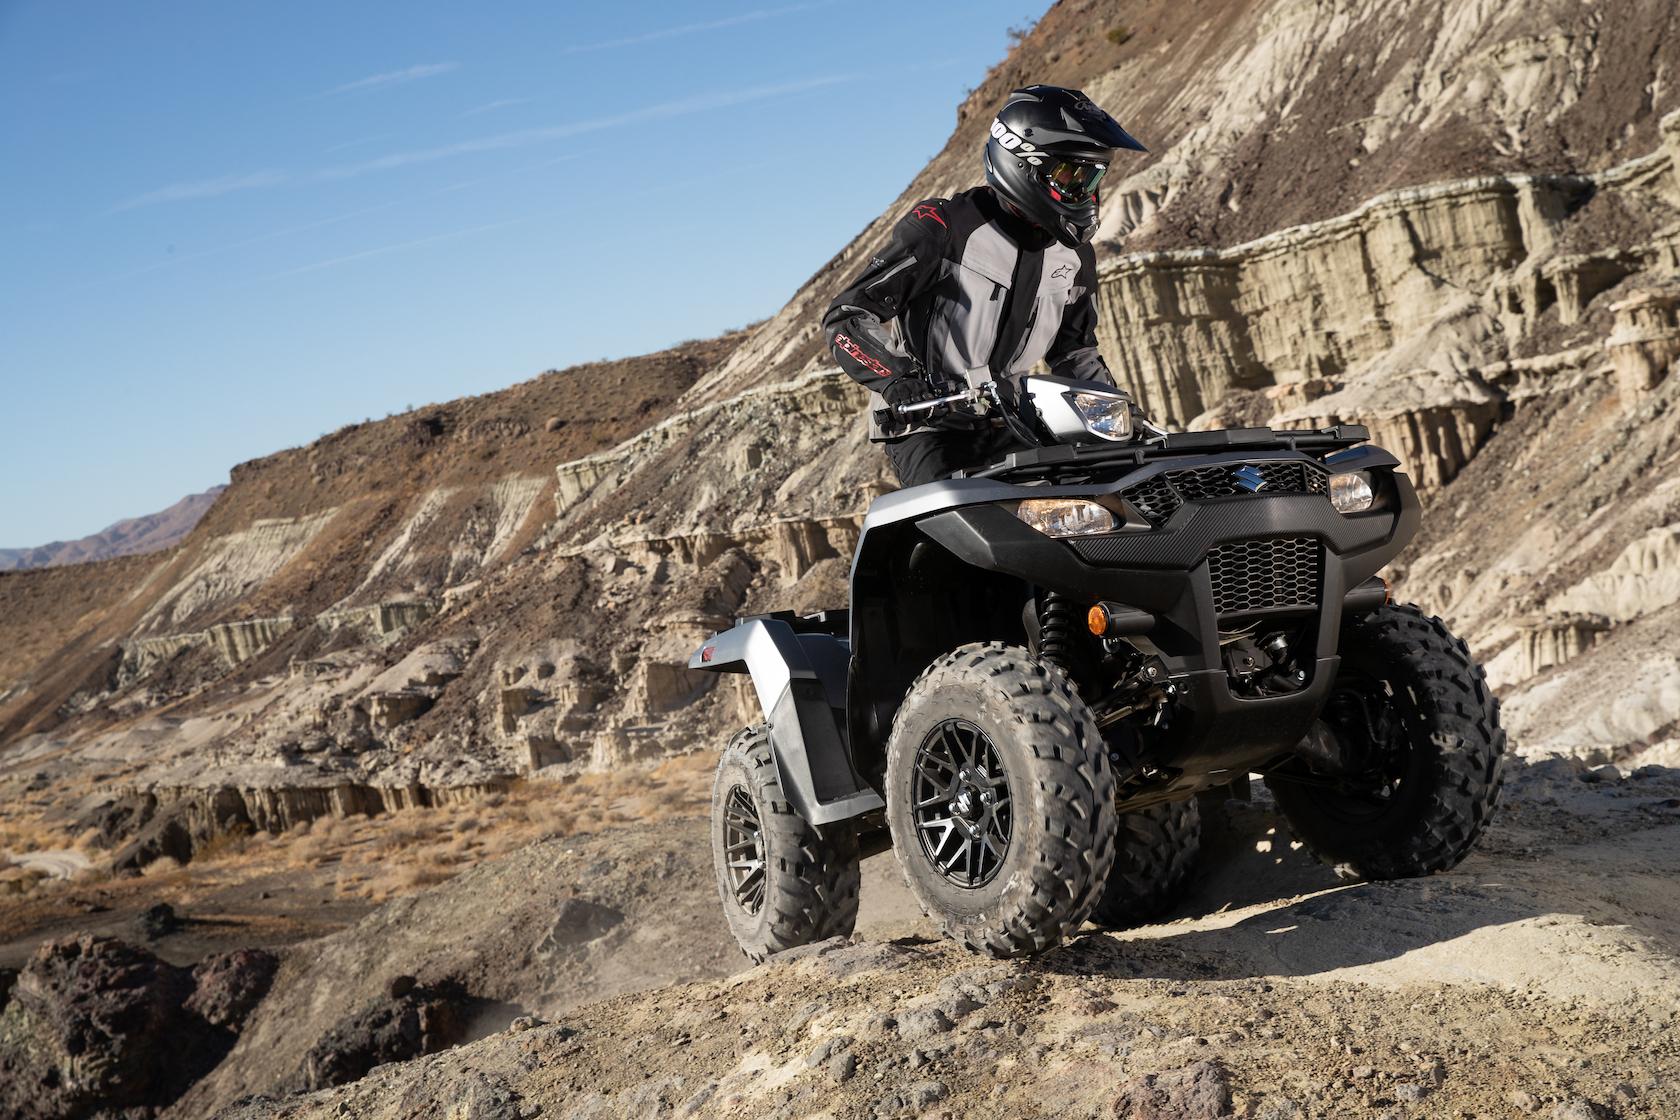 210610 Suzuki KingQuad action